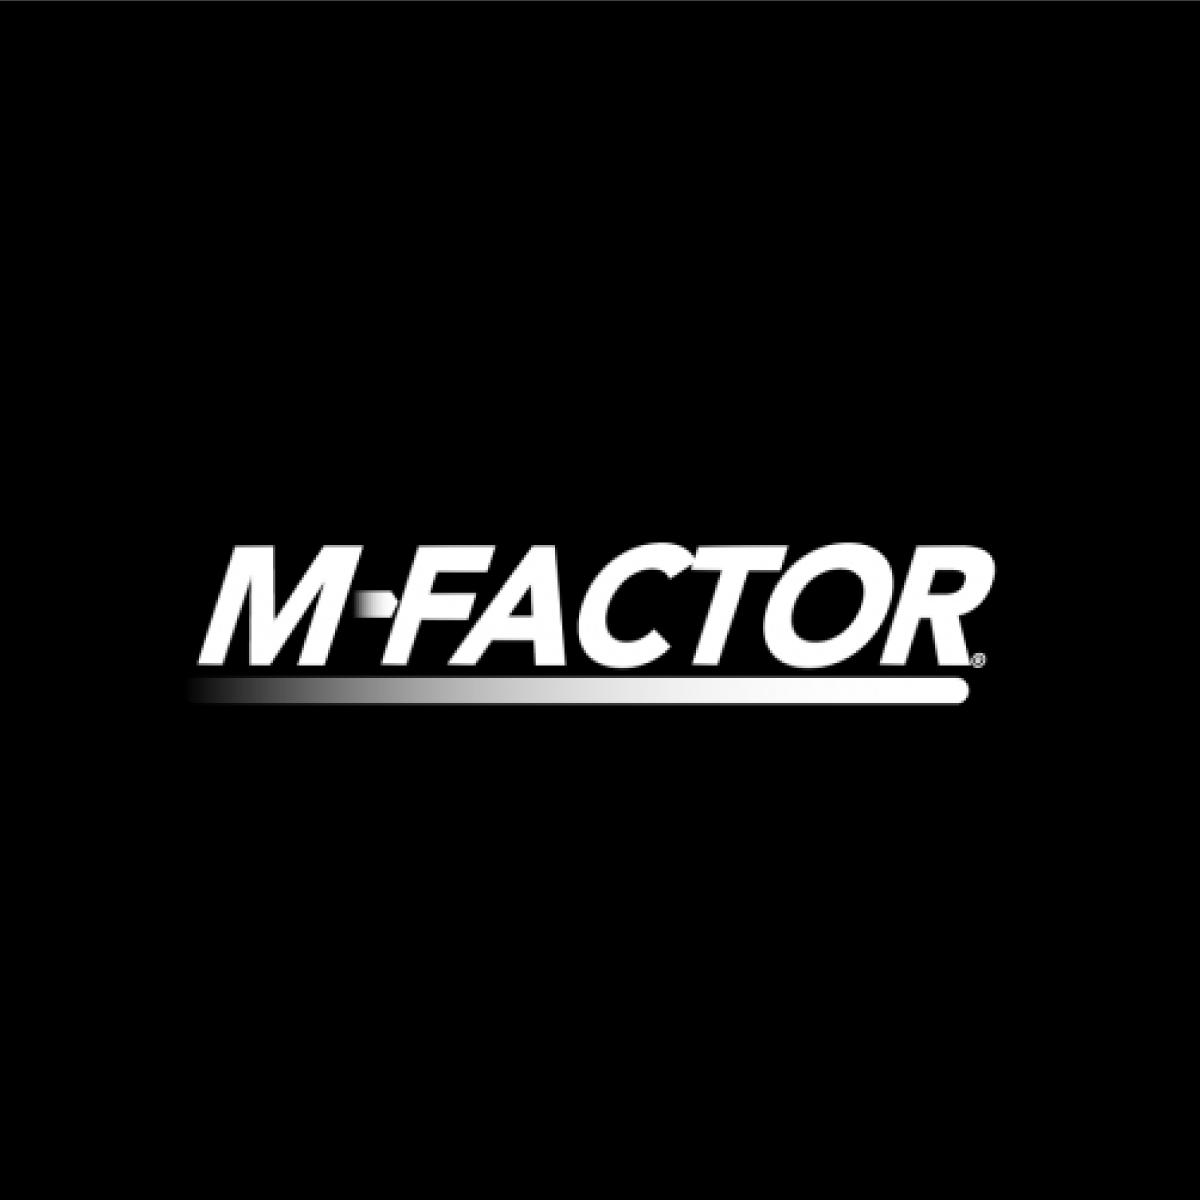 MFACTOR